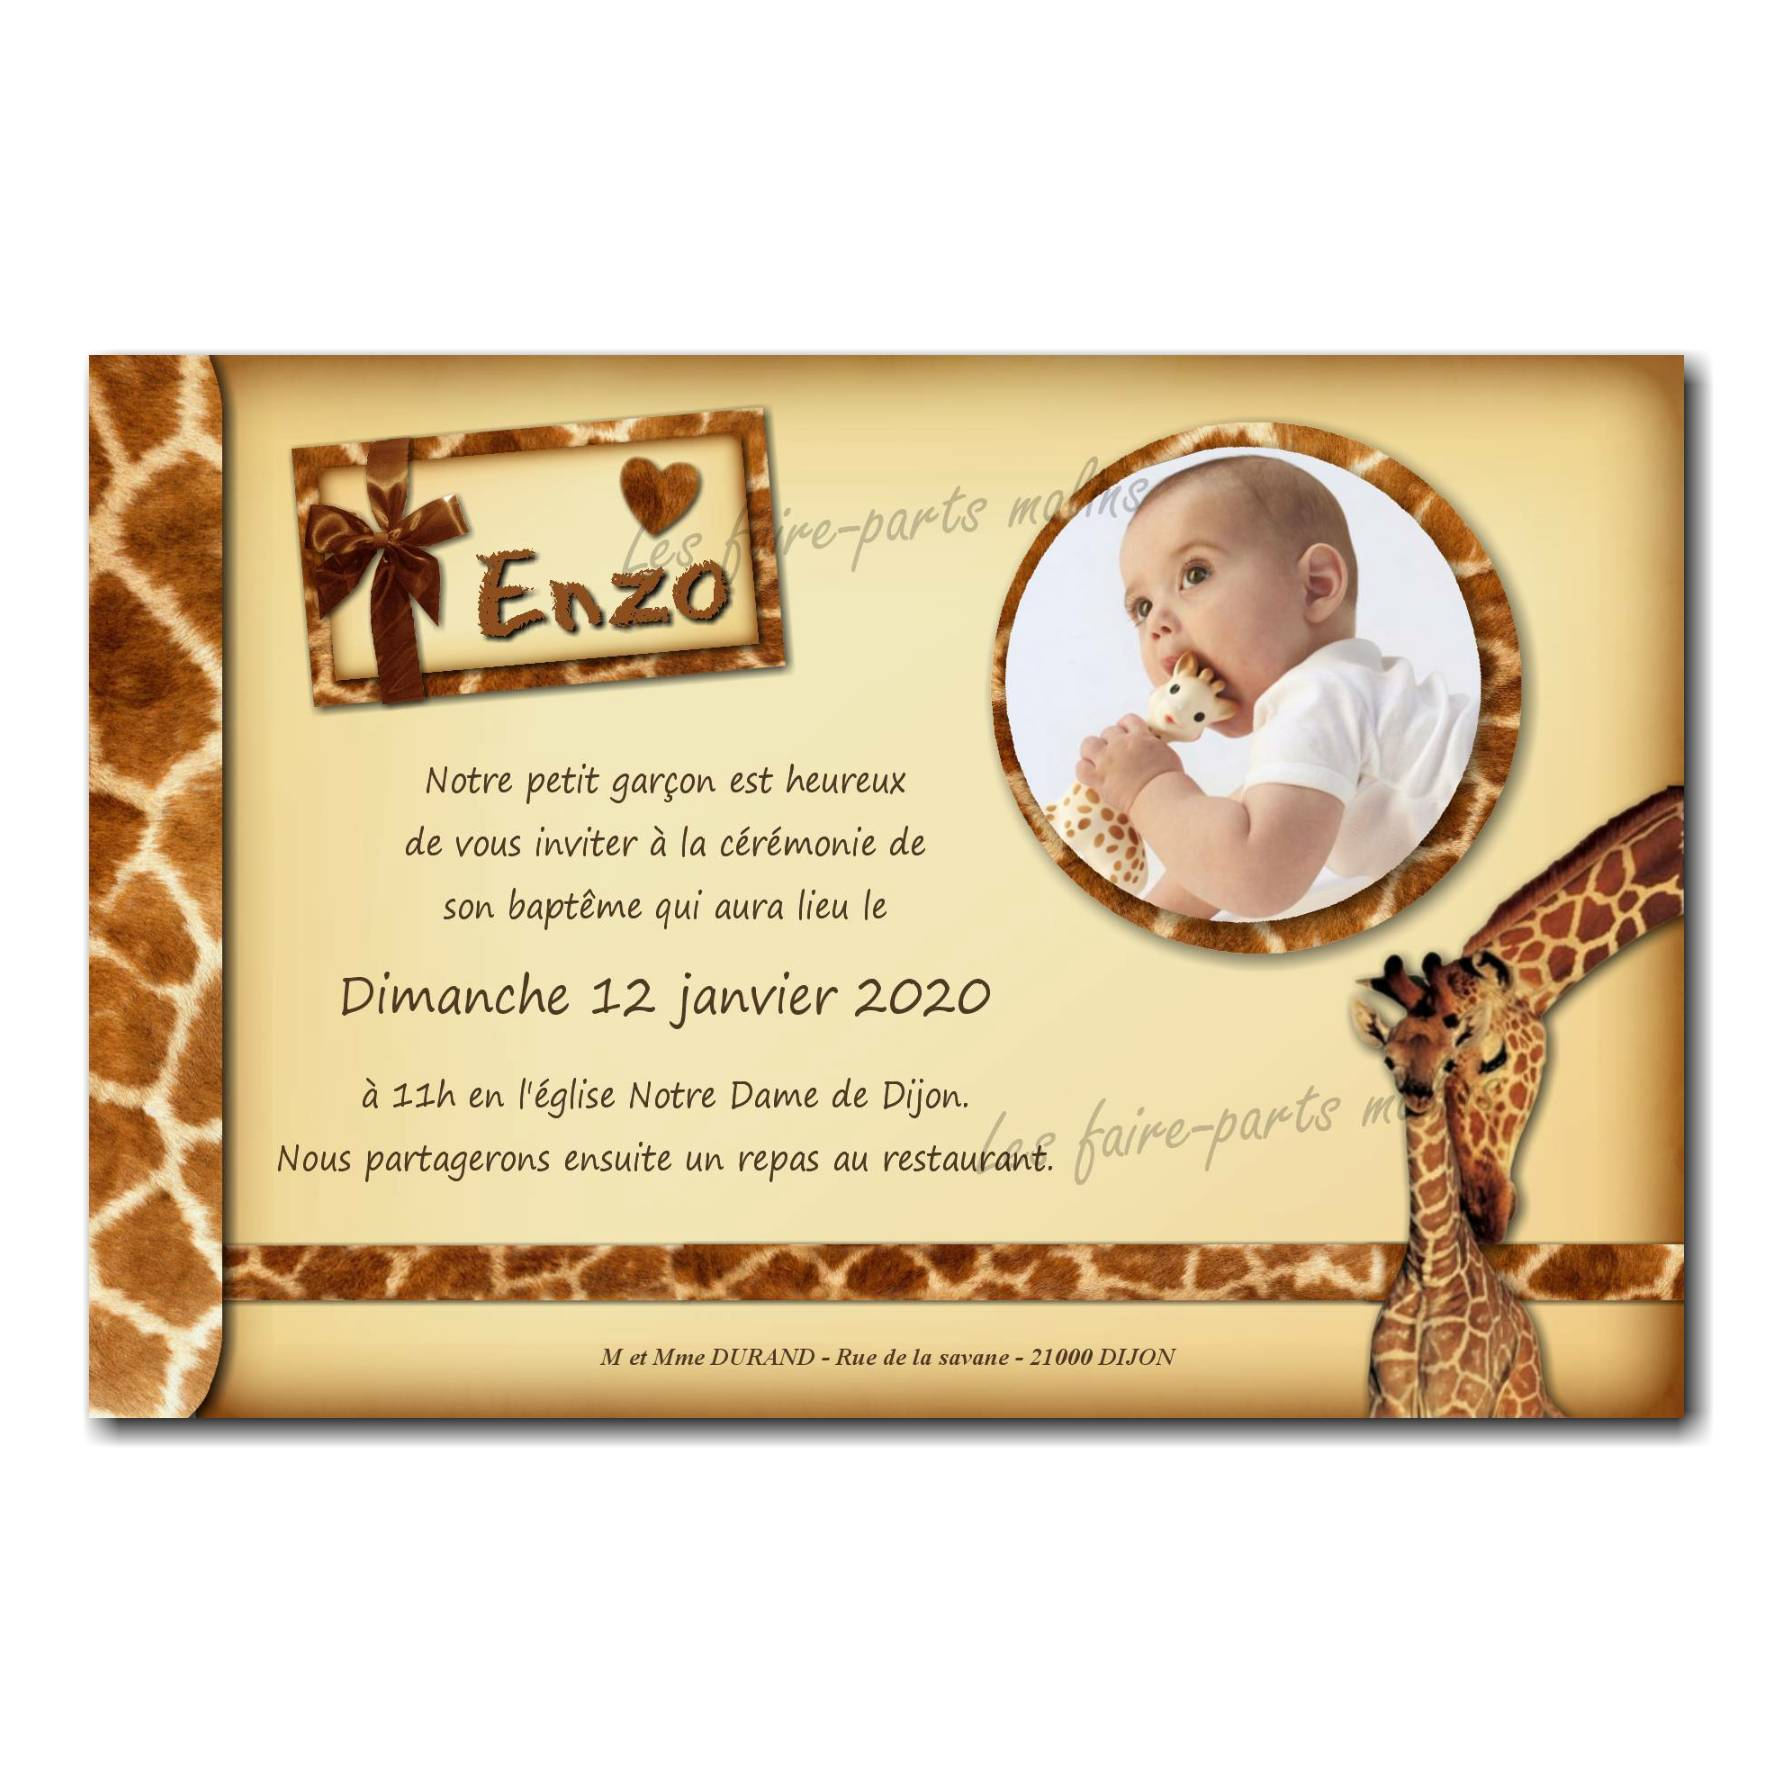 Faire part maman girafe avec petit bébé